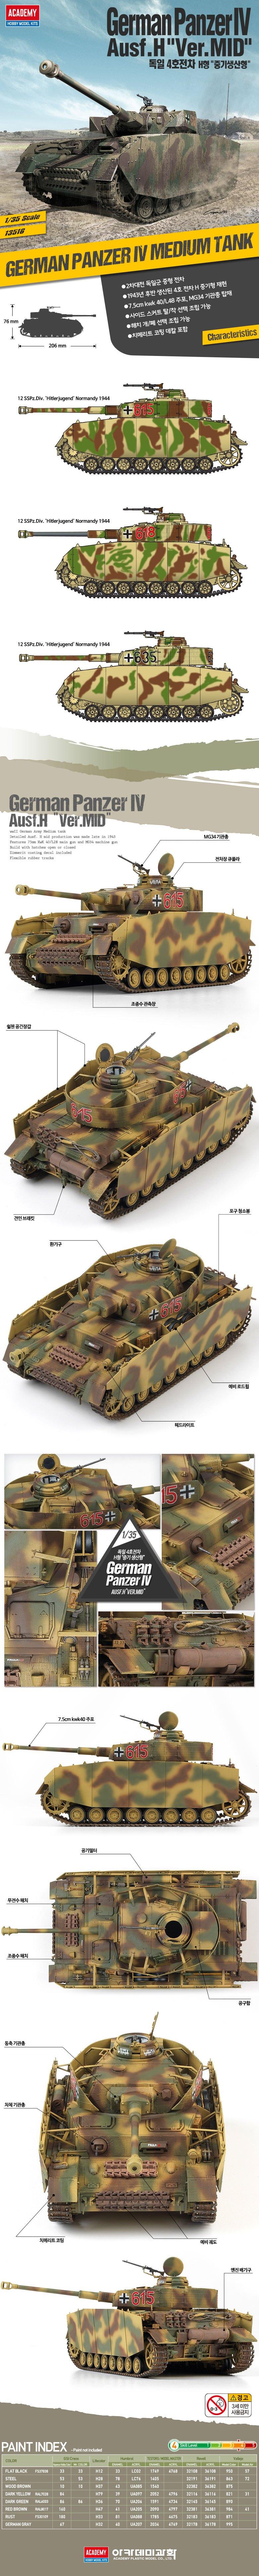 13516_german_panzer4_kr.jpg